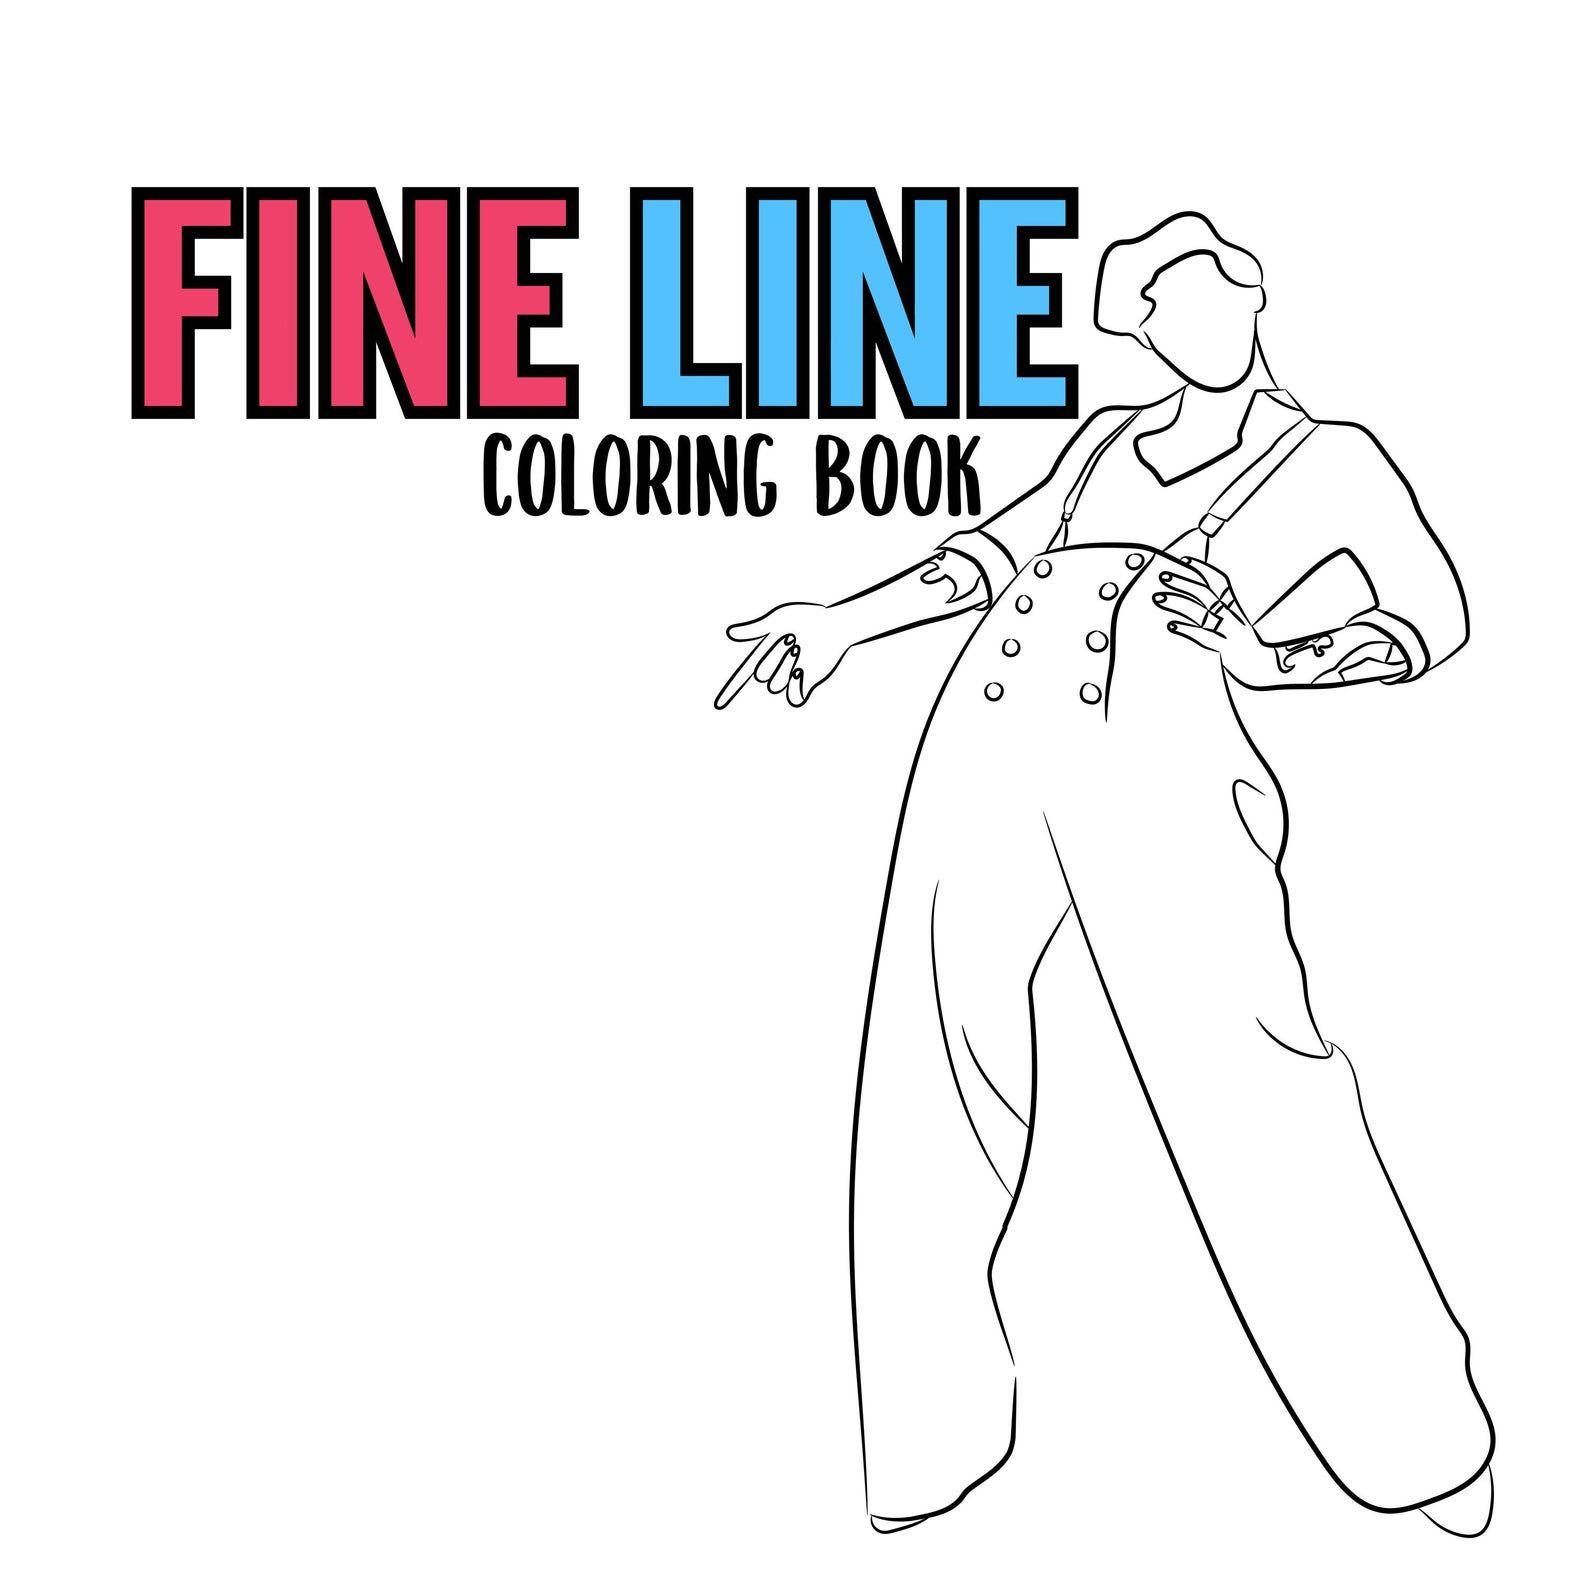 Harry Styles Coloring Book Digital Etsy In 2020 Coloring Books Harry Styles Color